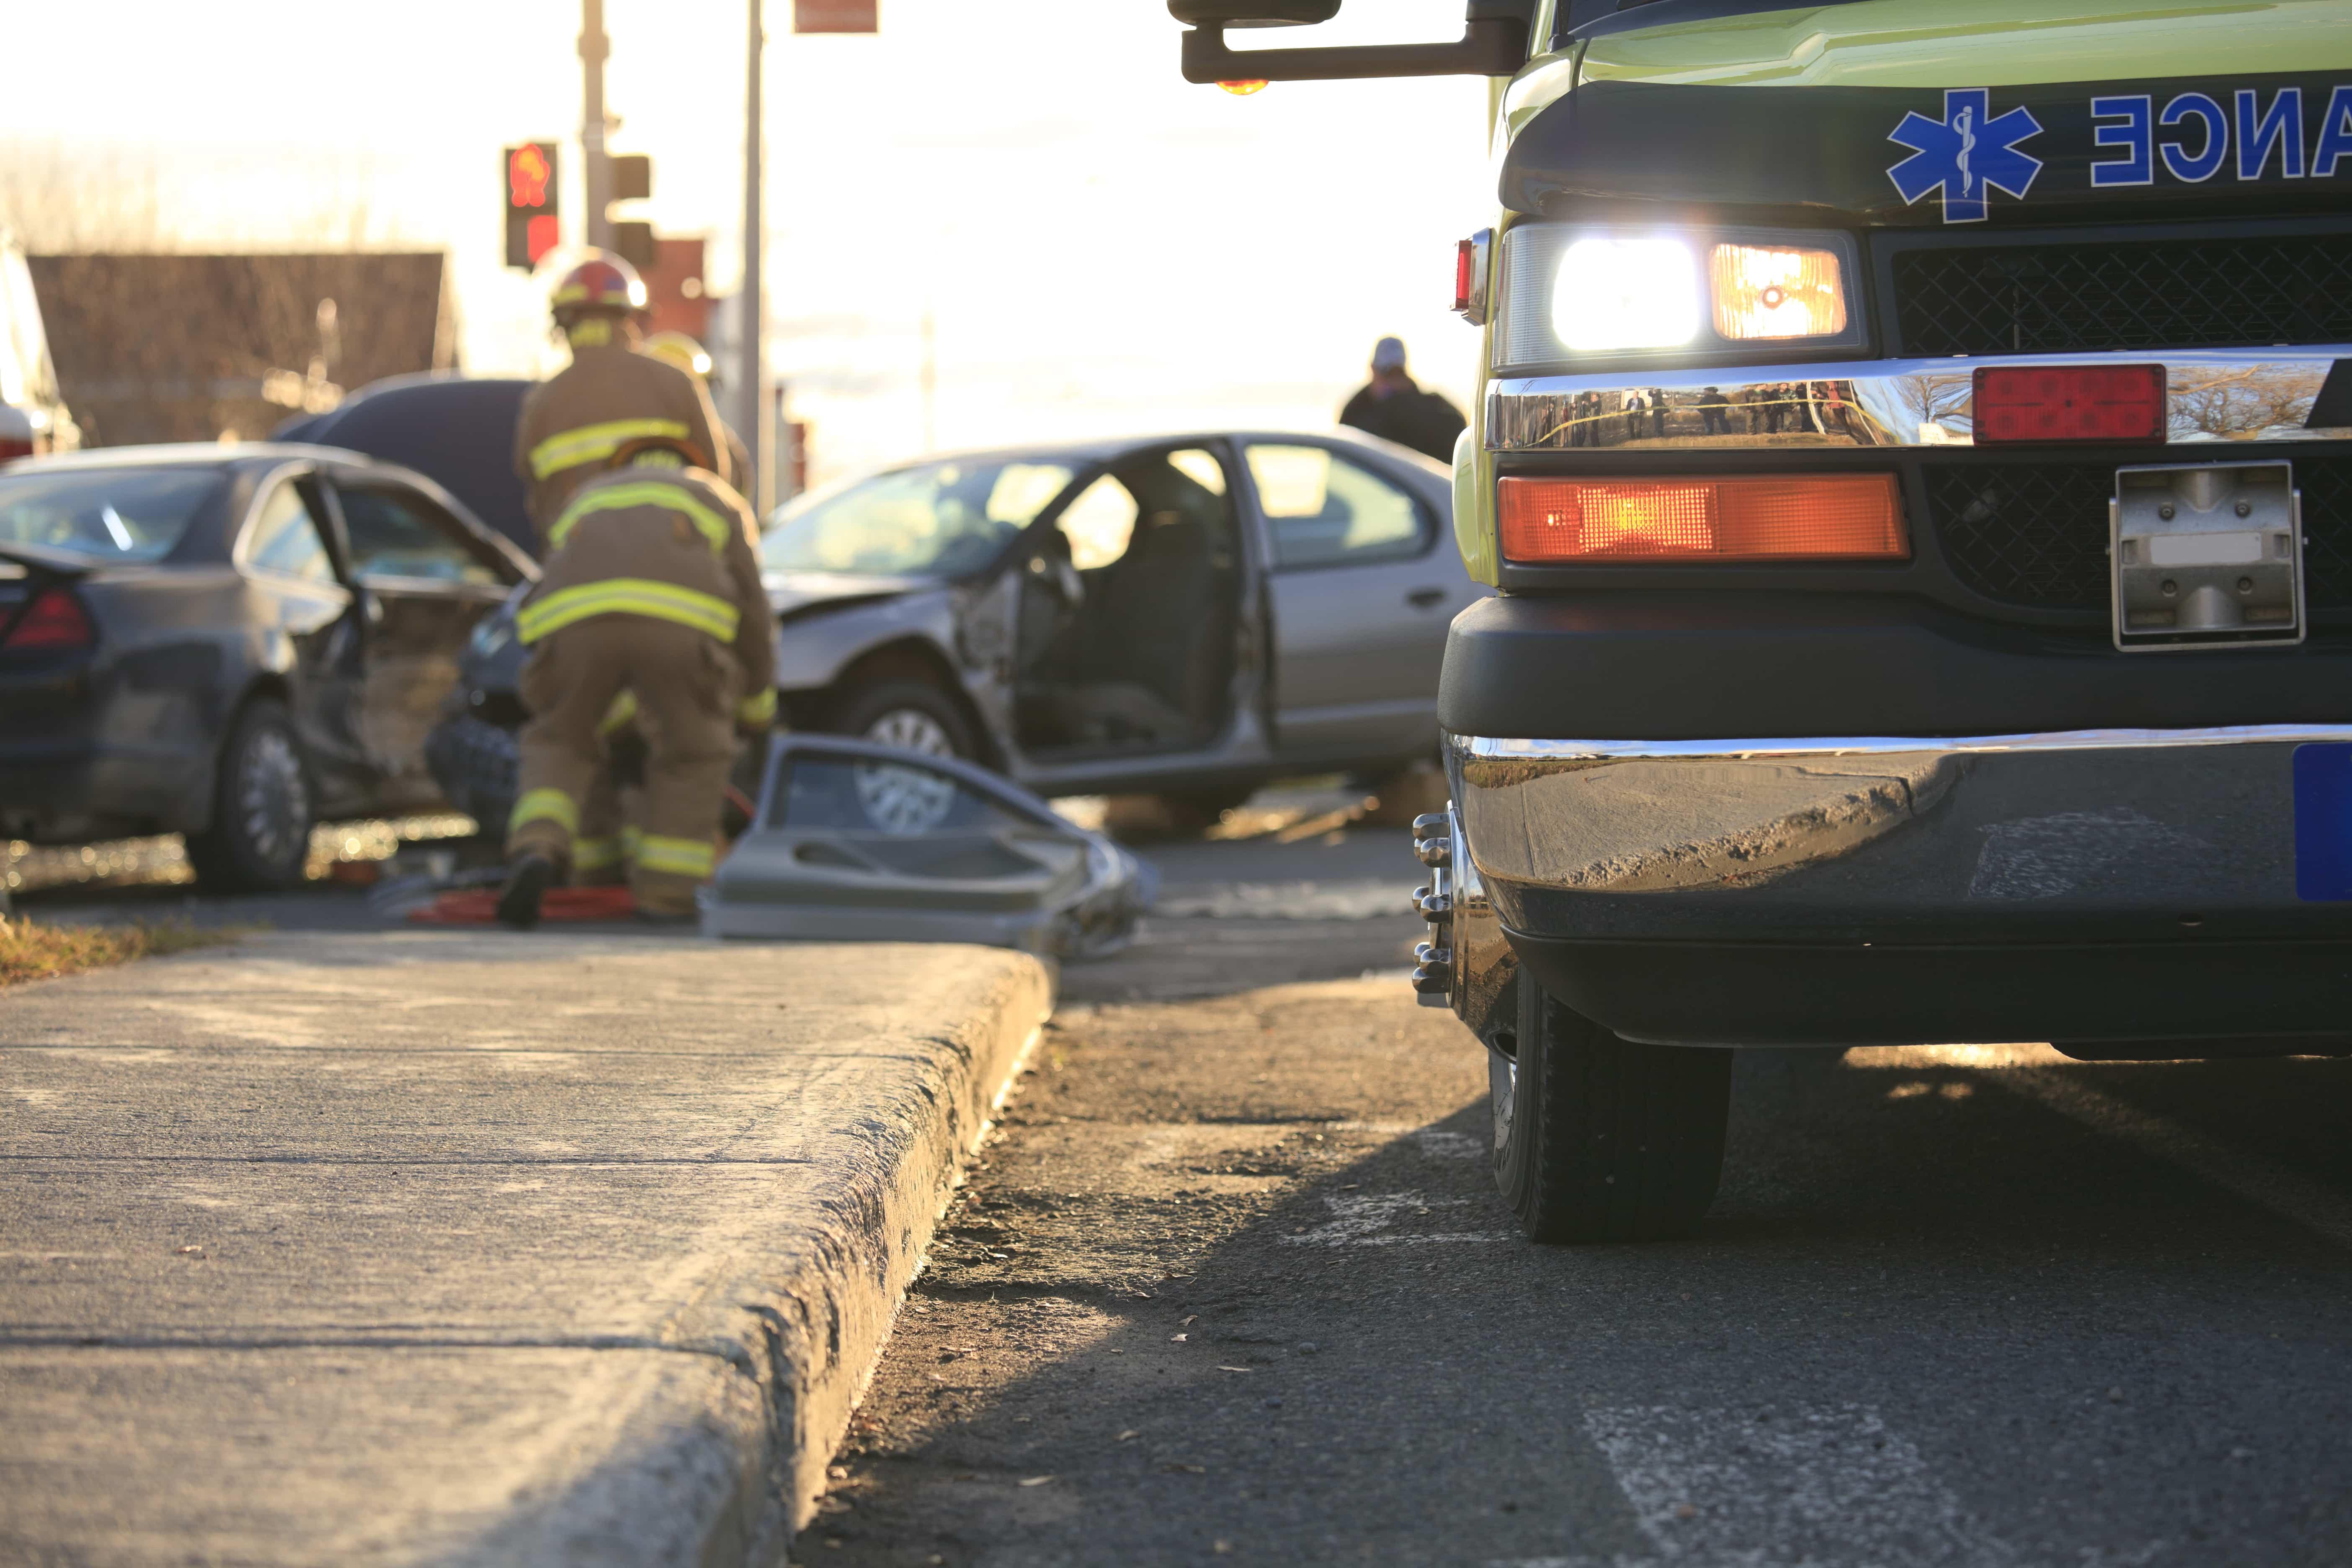 Car Insurance Claim Denied Atlanta Ga Car Accident Attorney